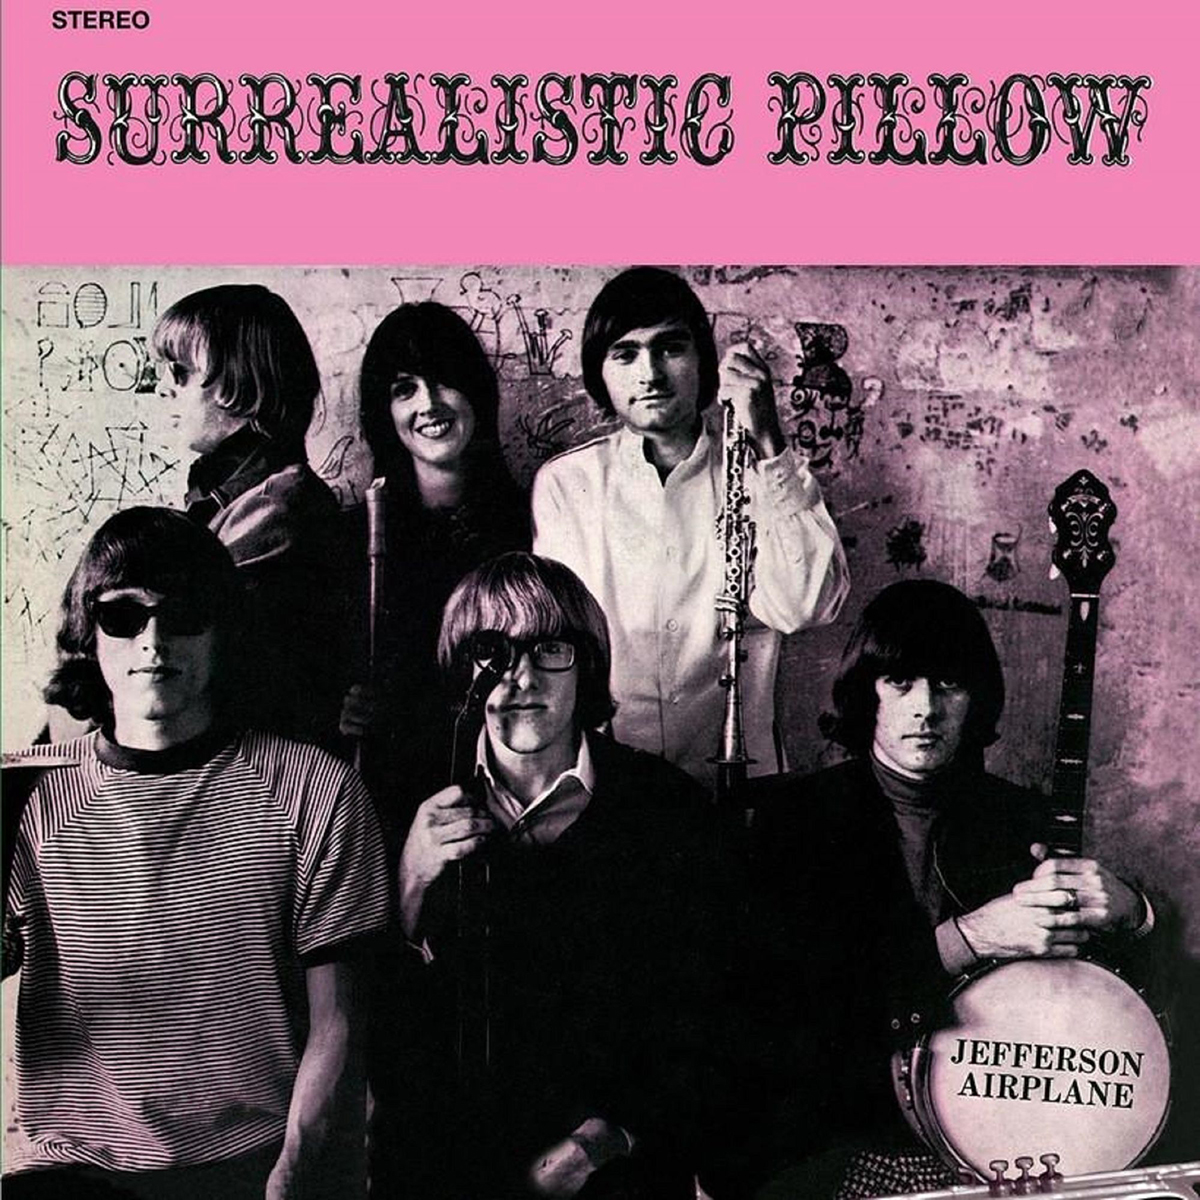 Jefferson Airplane - Surrealistic Pillow (180 Gram Audiophile Pink Vinyl/Limited Edition/Gatefold Cover)